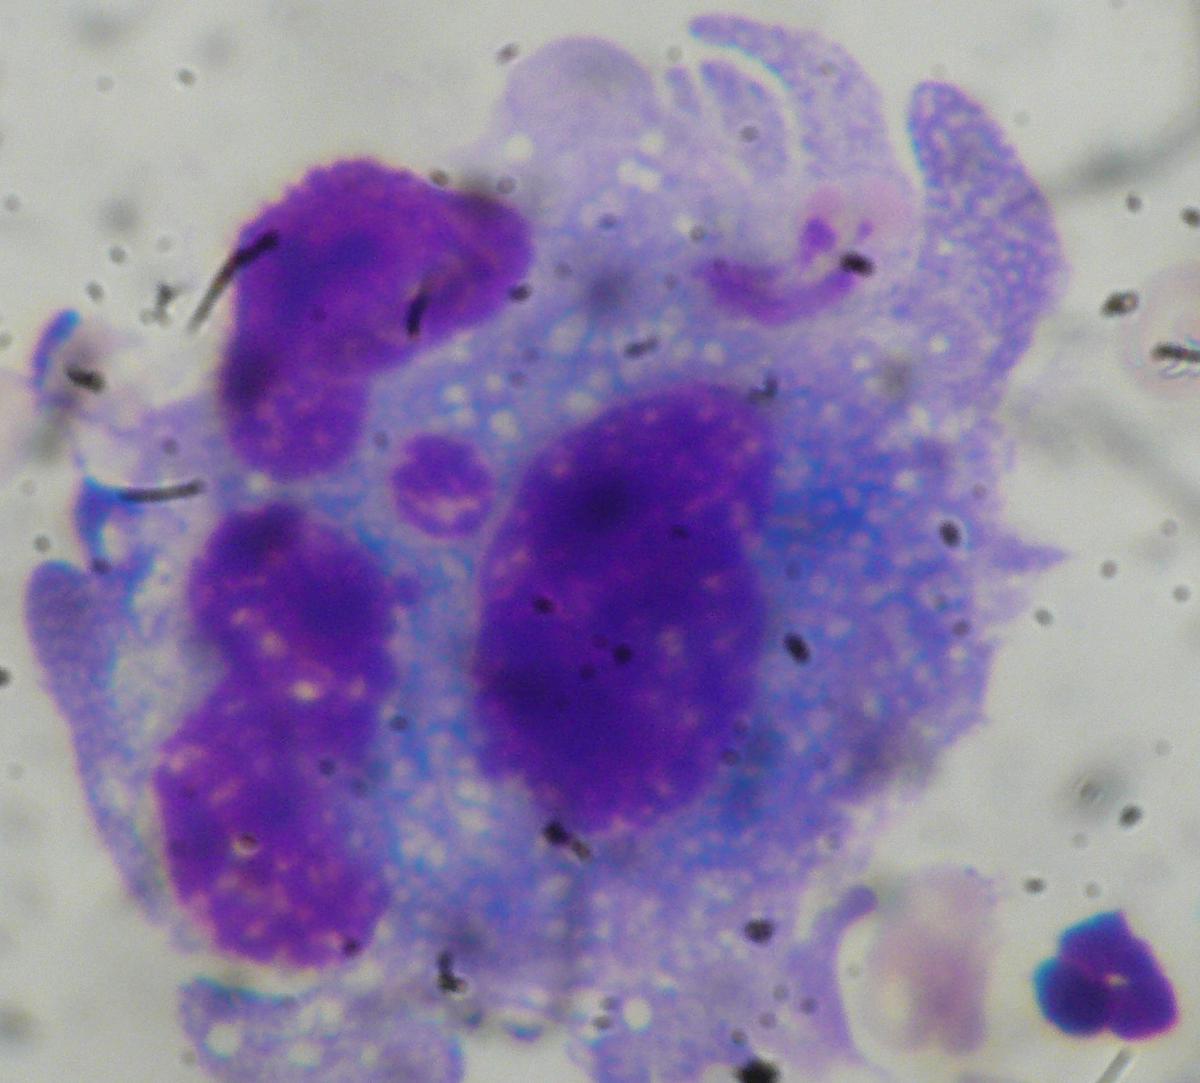 liquide pleural cytologie